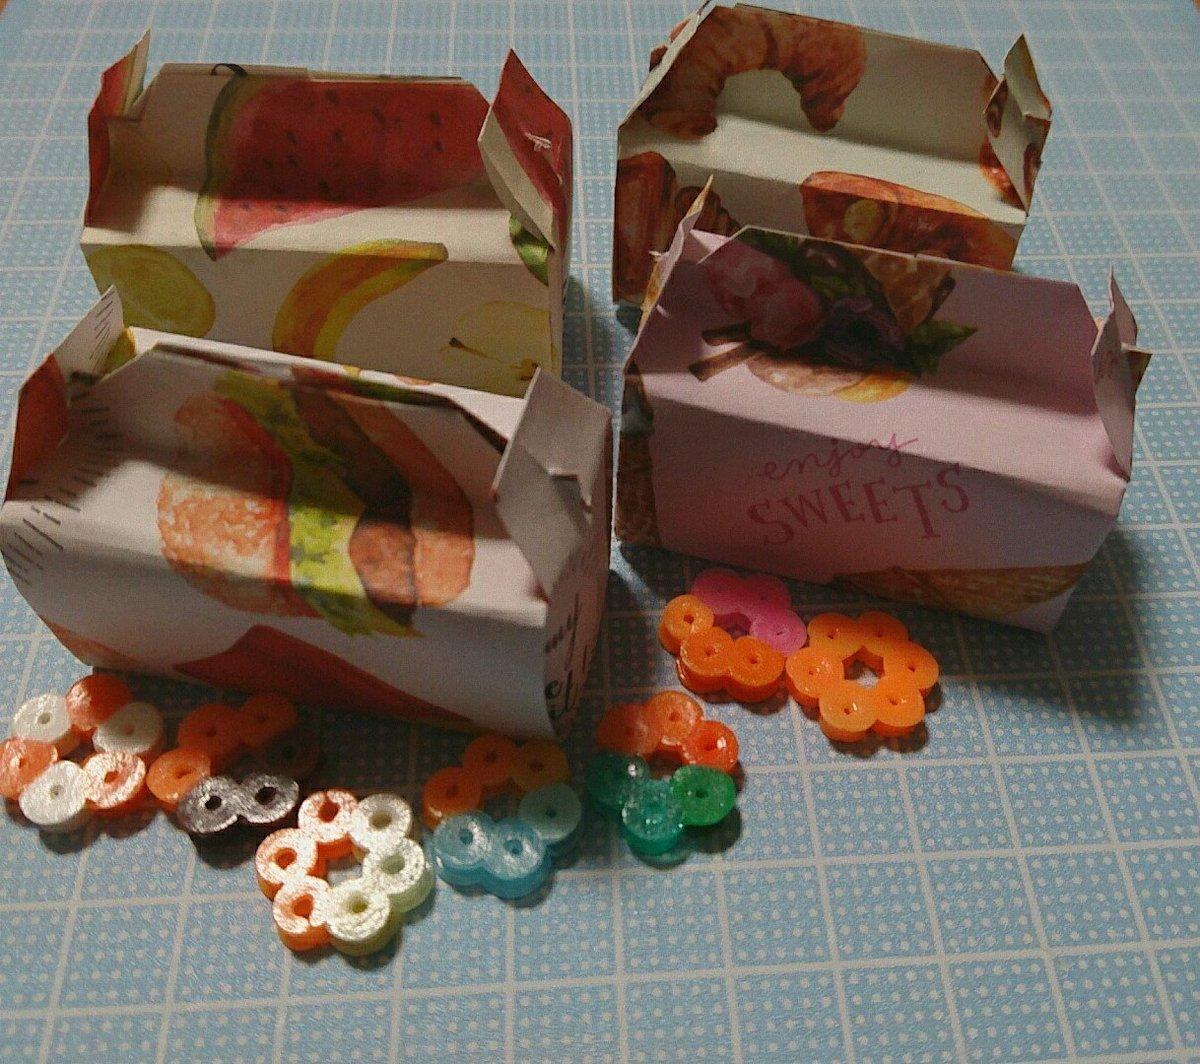 test ツイッターメディア - 折り紙1枚でドーナツバッグ??  セリアで買った食べ物柄折り紙で。  三女がアイロンビーズでドーナツを作ってくれましたΨ( 'ч' ☆)  #セリア #折り紙作品 https://t.co/cFbgjlyrKM